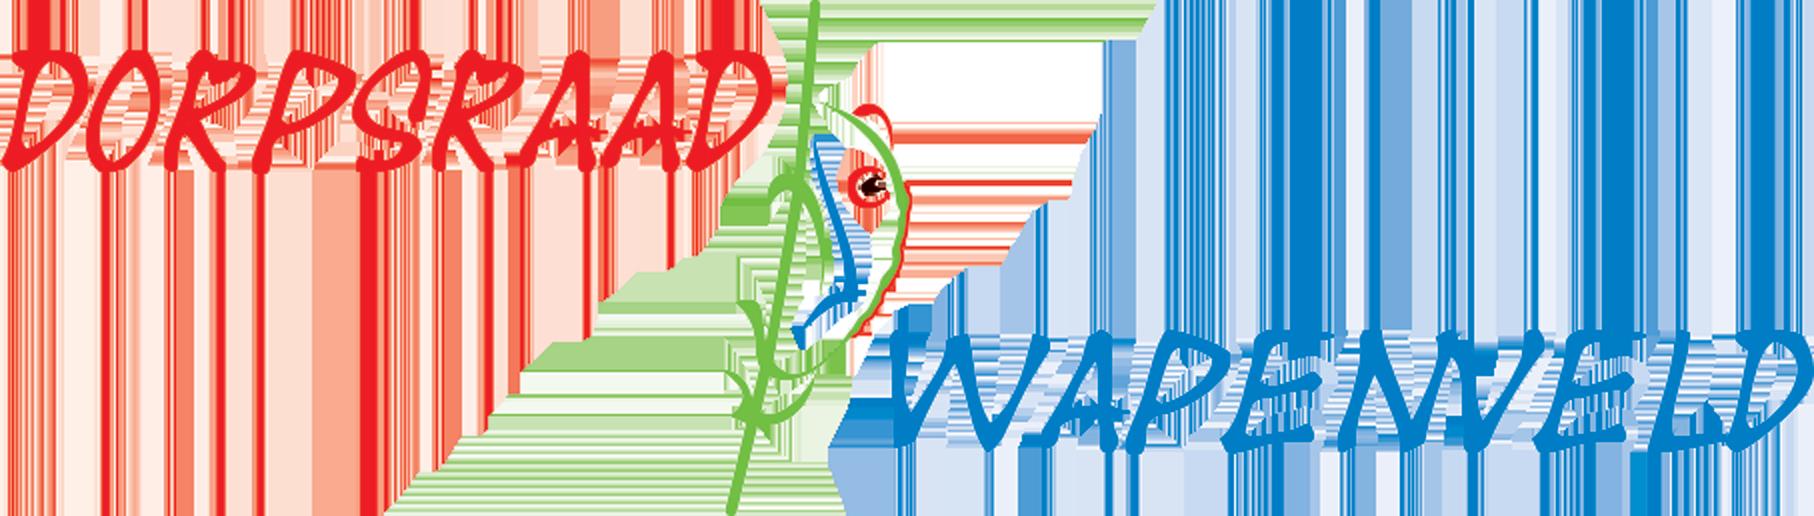 Dorpsraad Wapenveld